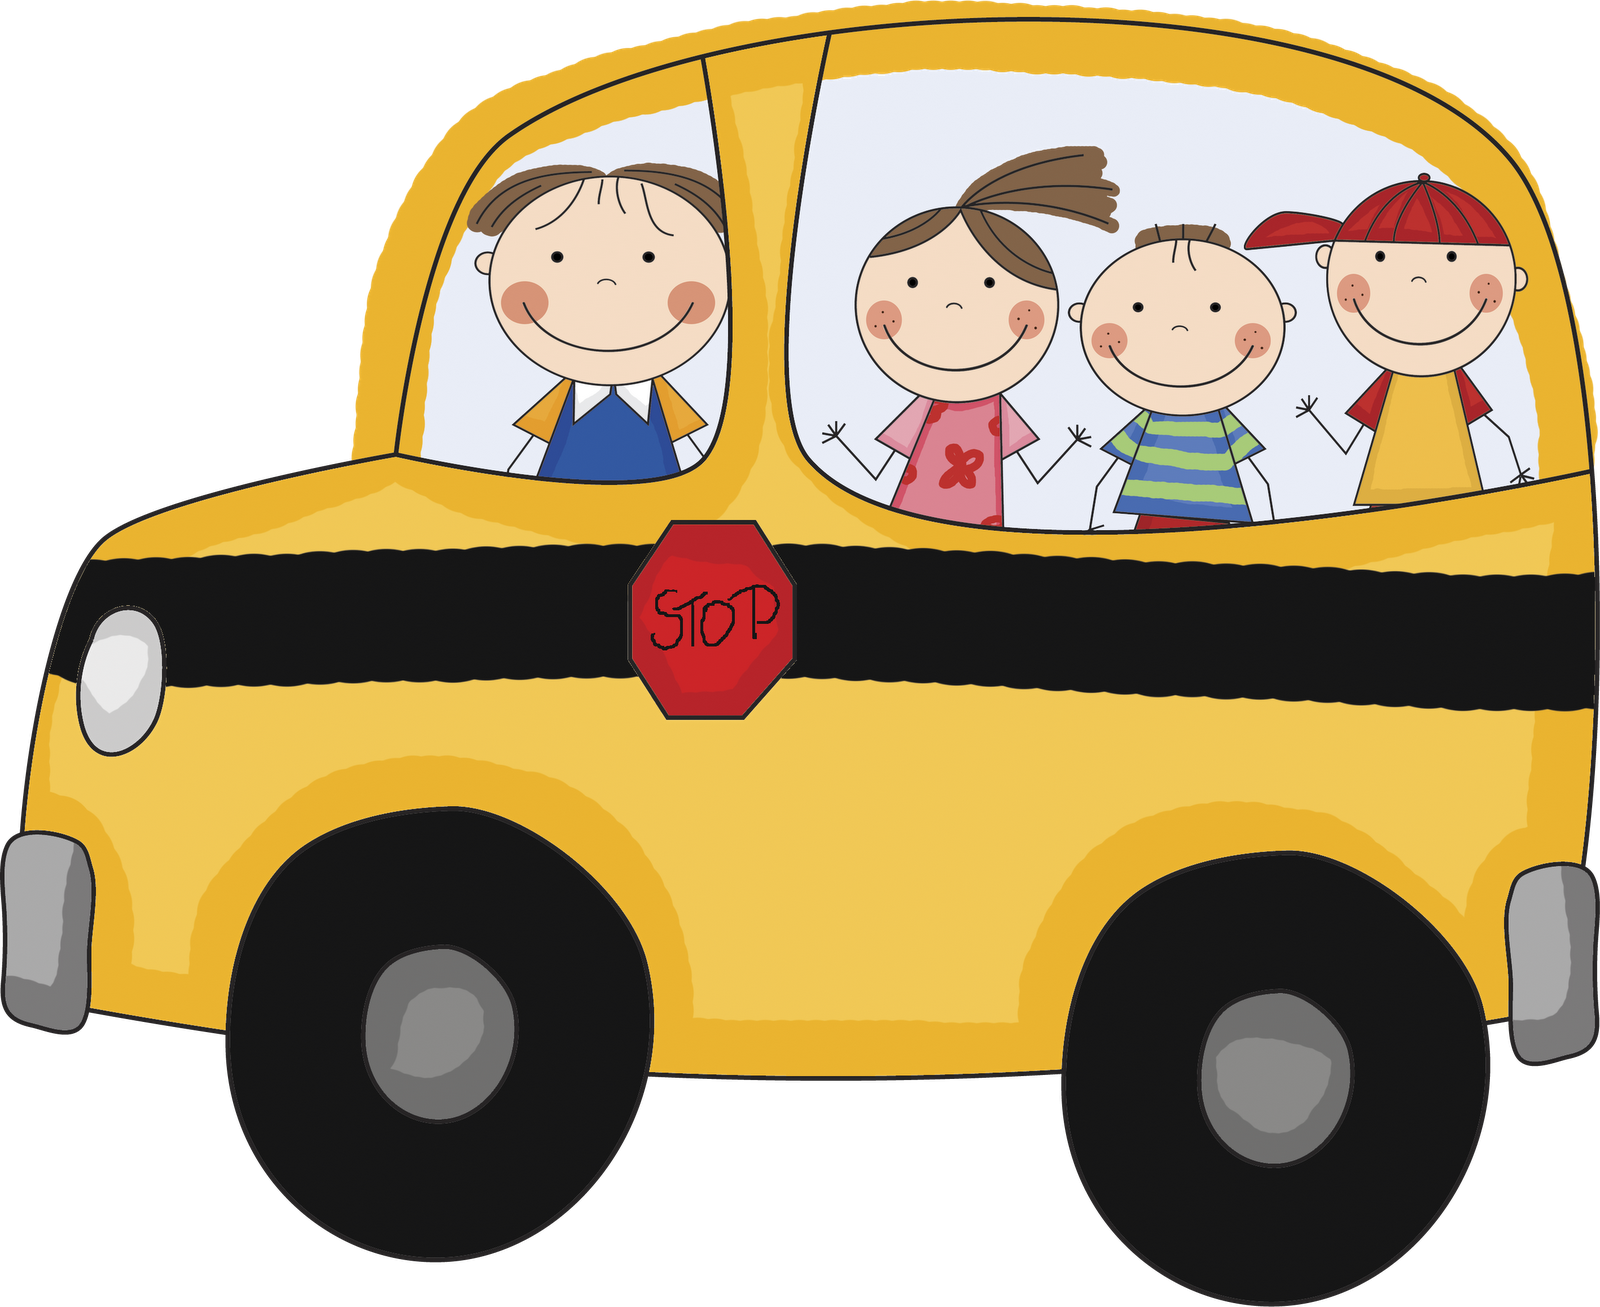 School bus clipart images 3 school bus clip art vector 4 4